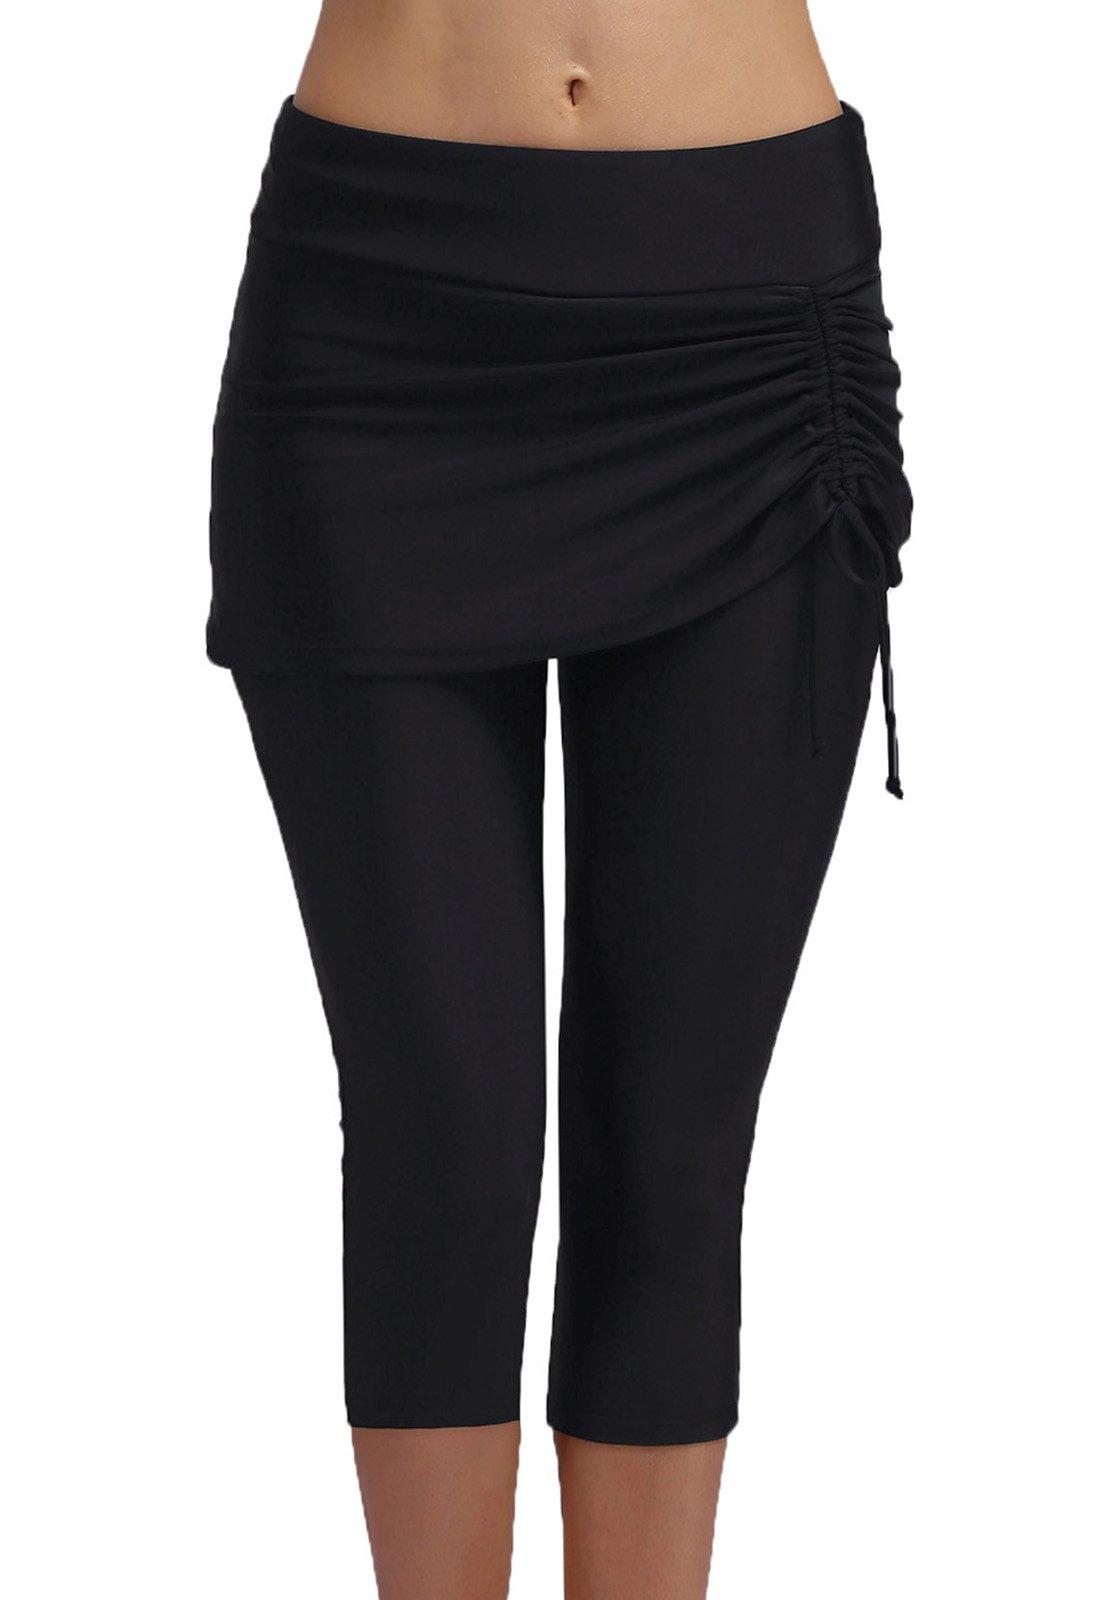 FanShou Women Capris Swim Pants Tights Sport Swimming Surfing Leggings Sun Protection (X-Large, Black)